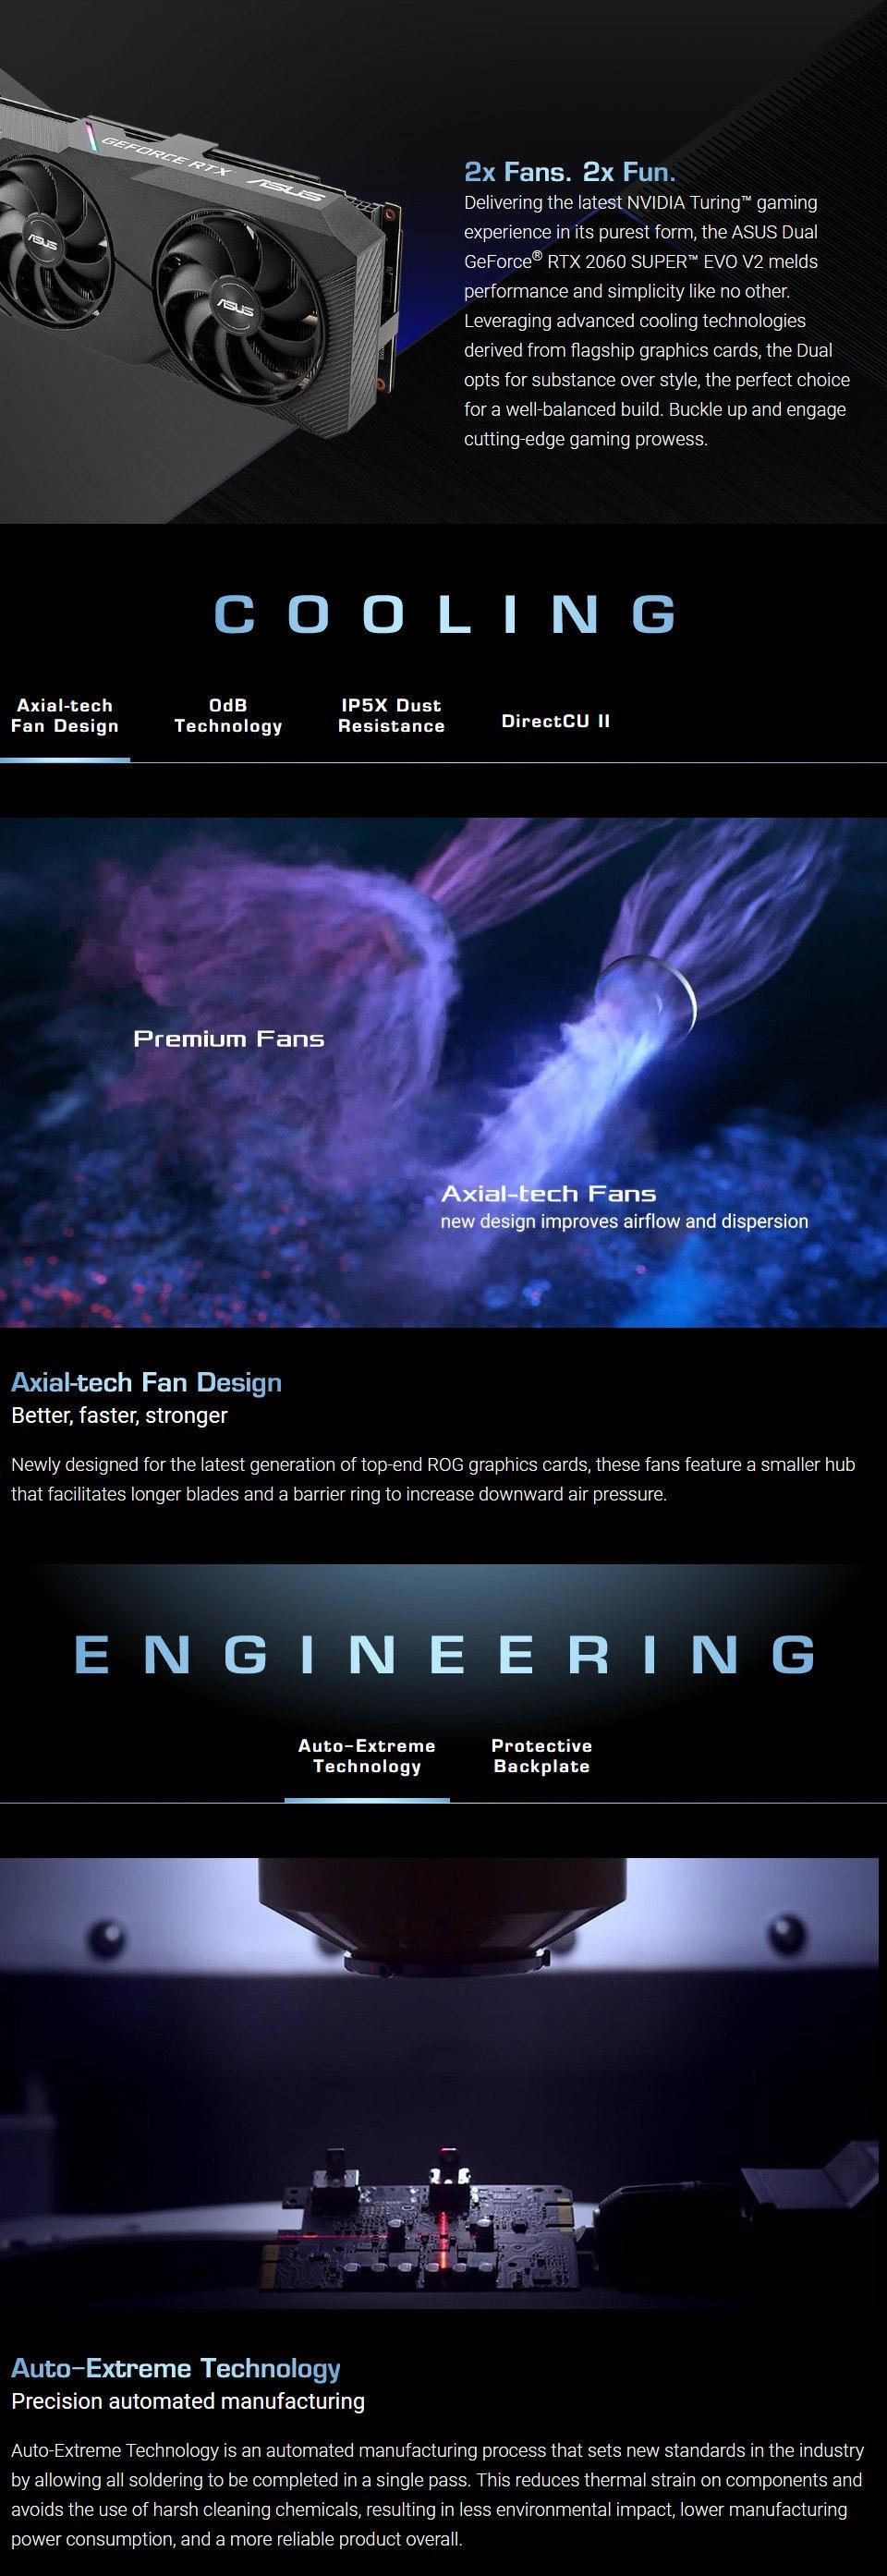 ASUS GeForce RTX 2060 Super Dual OC EVO 8GB V2 features